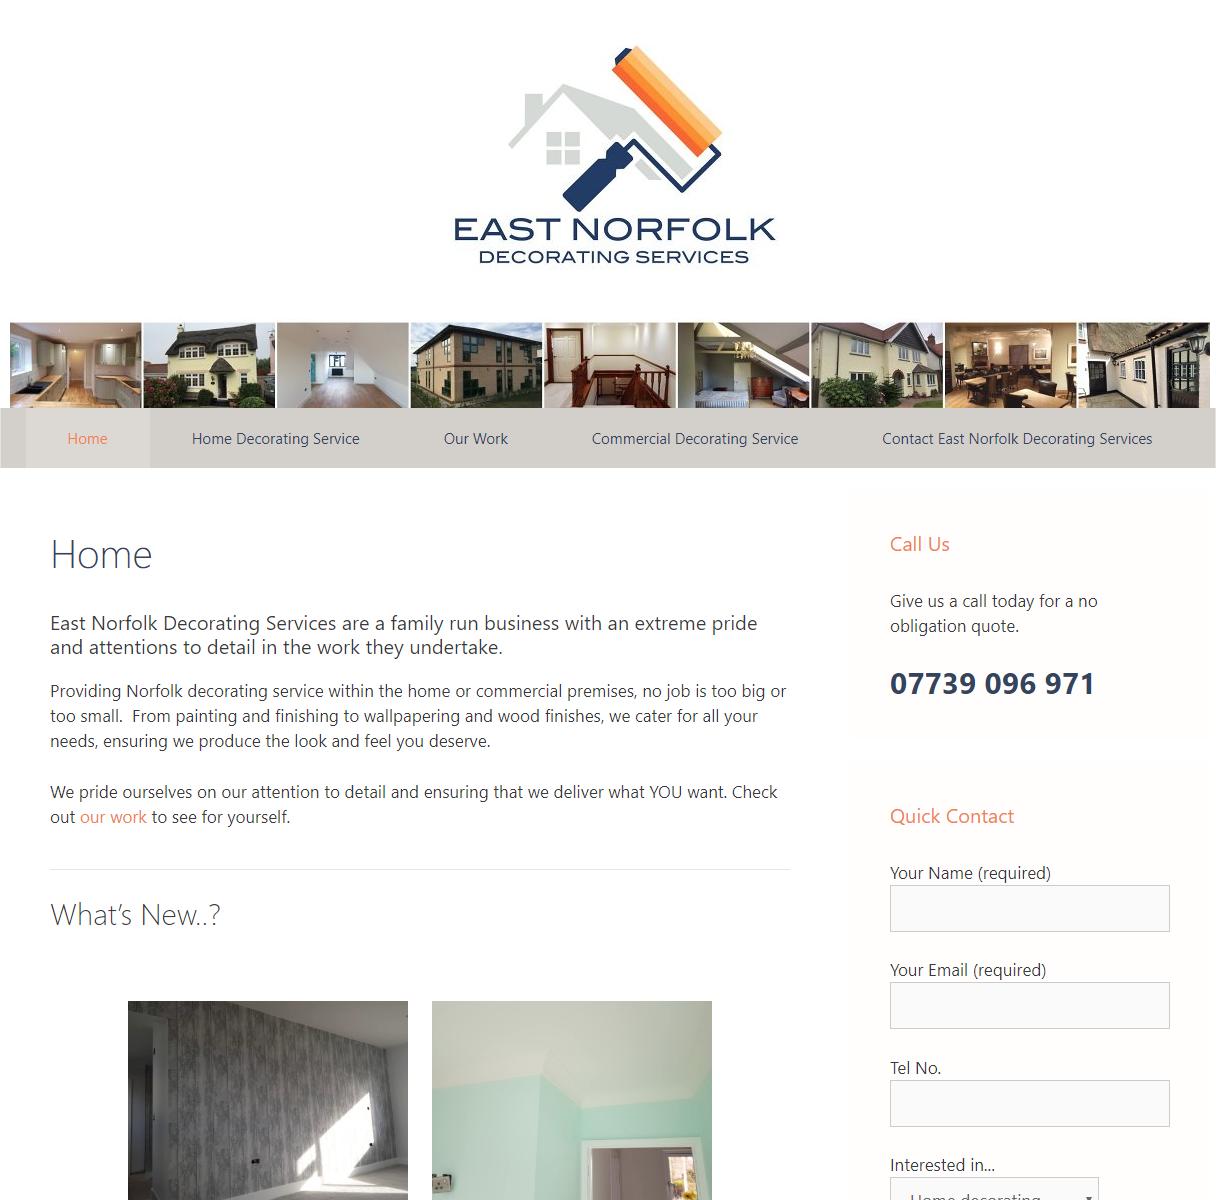 New website designed